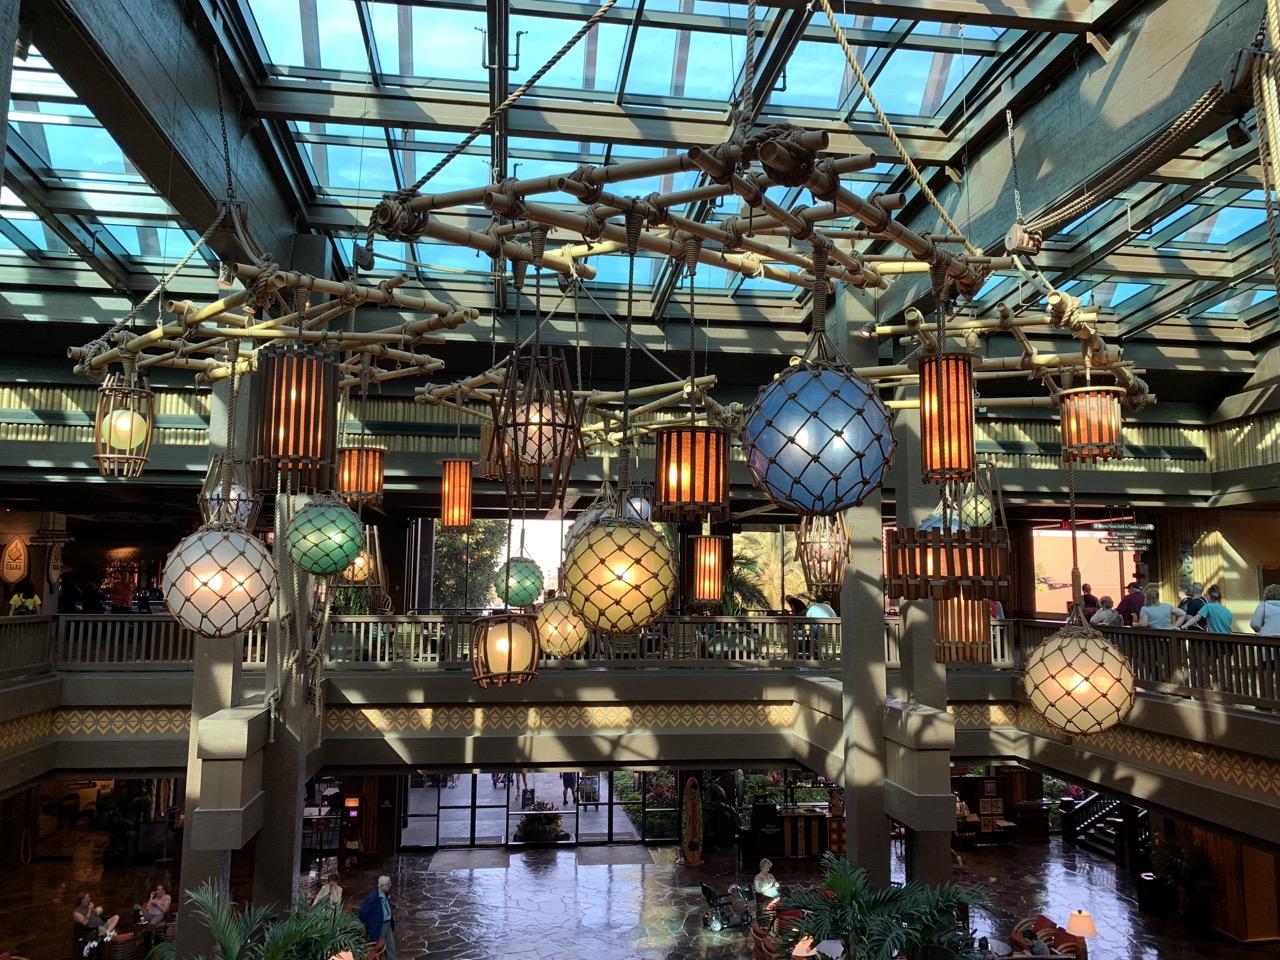 disney world best deluxe resort hotel ranking 00 poly lobby.jpeg